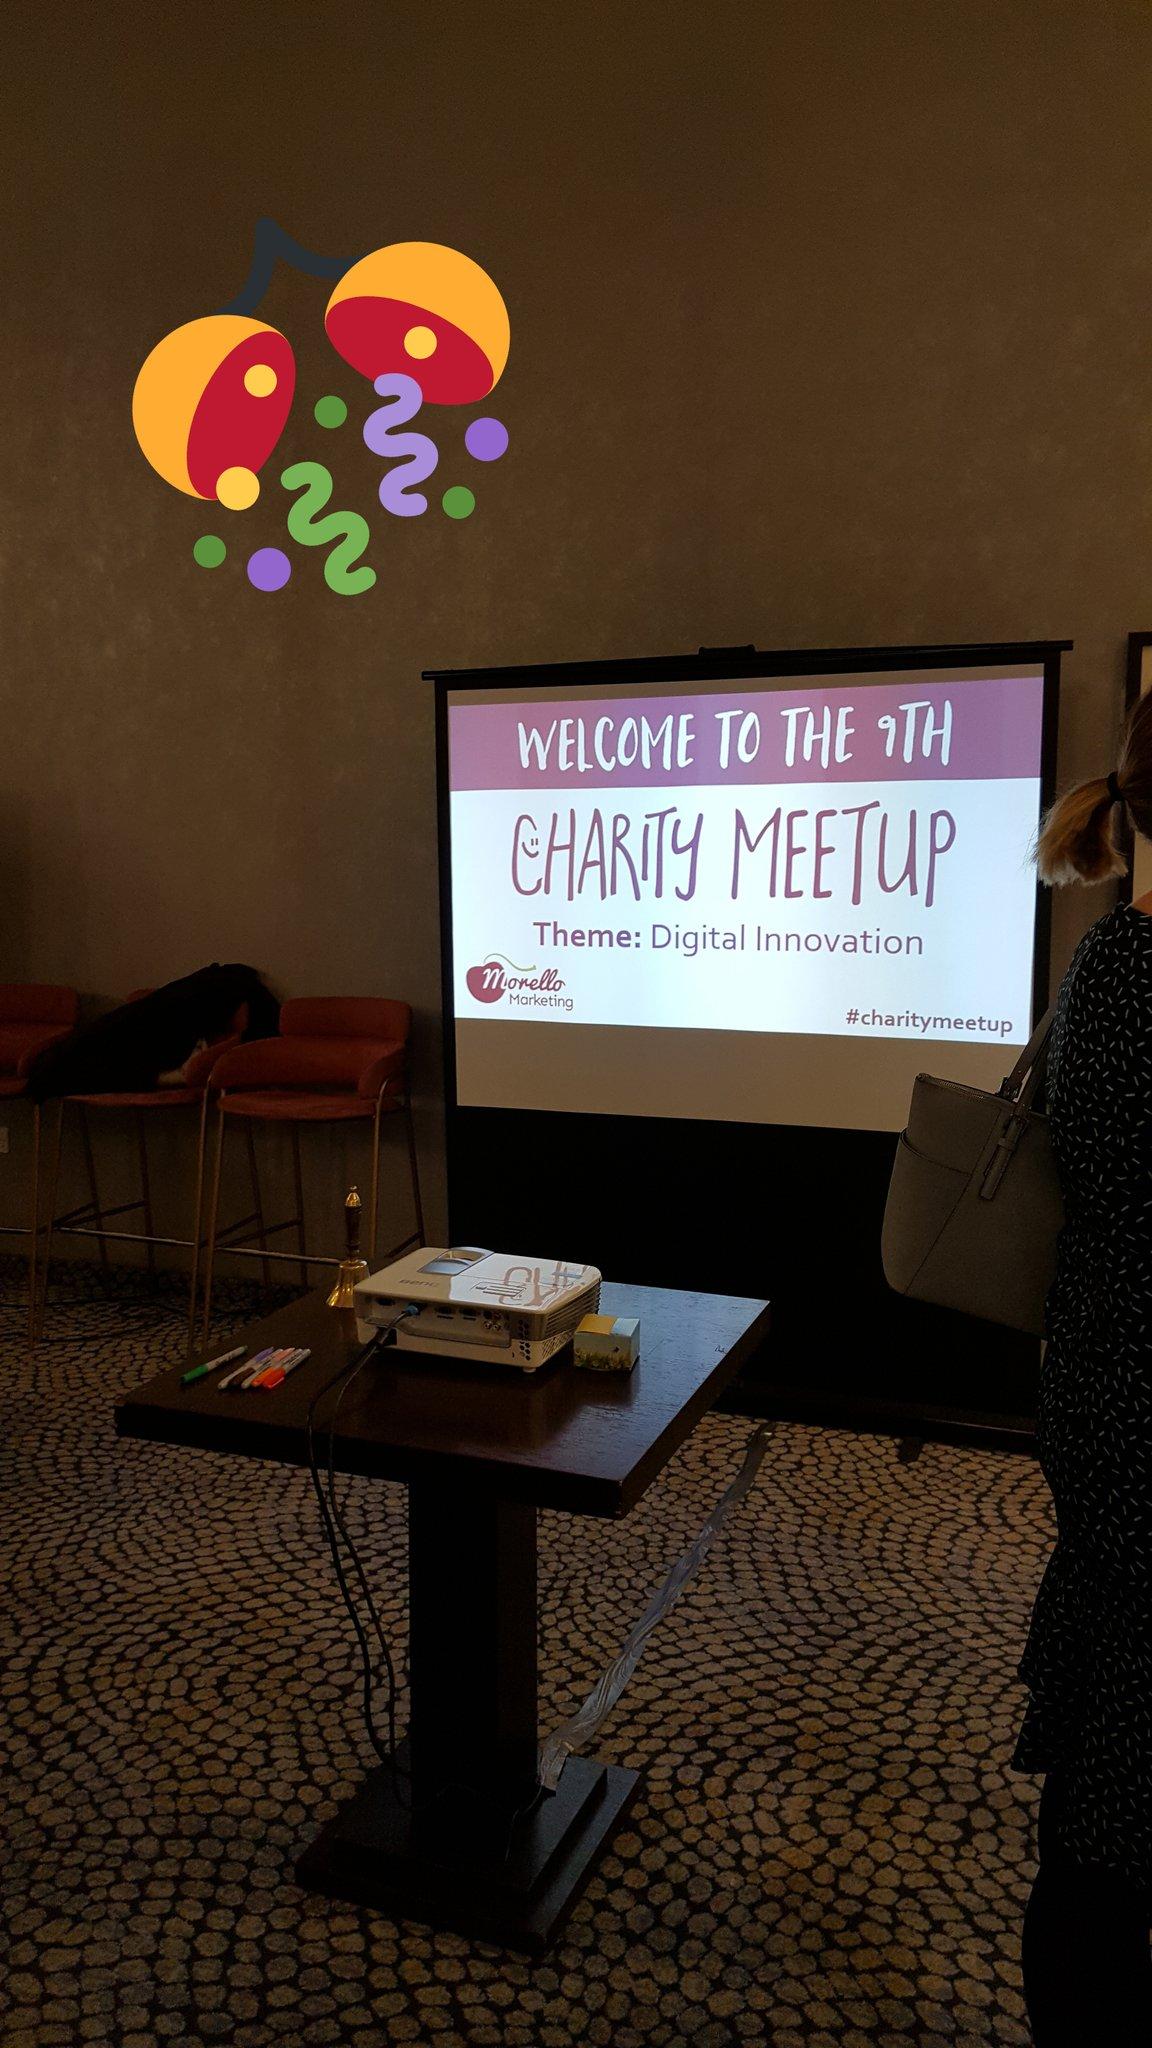 All ready for the #CharityMeetup on #DigitalInnovation @goreckidawn https://t.co/sWuMehM8Gj